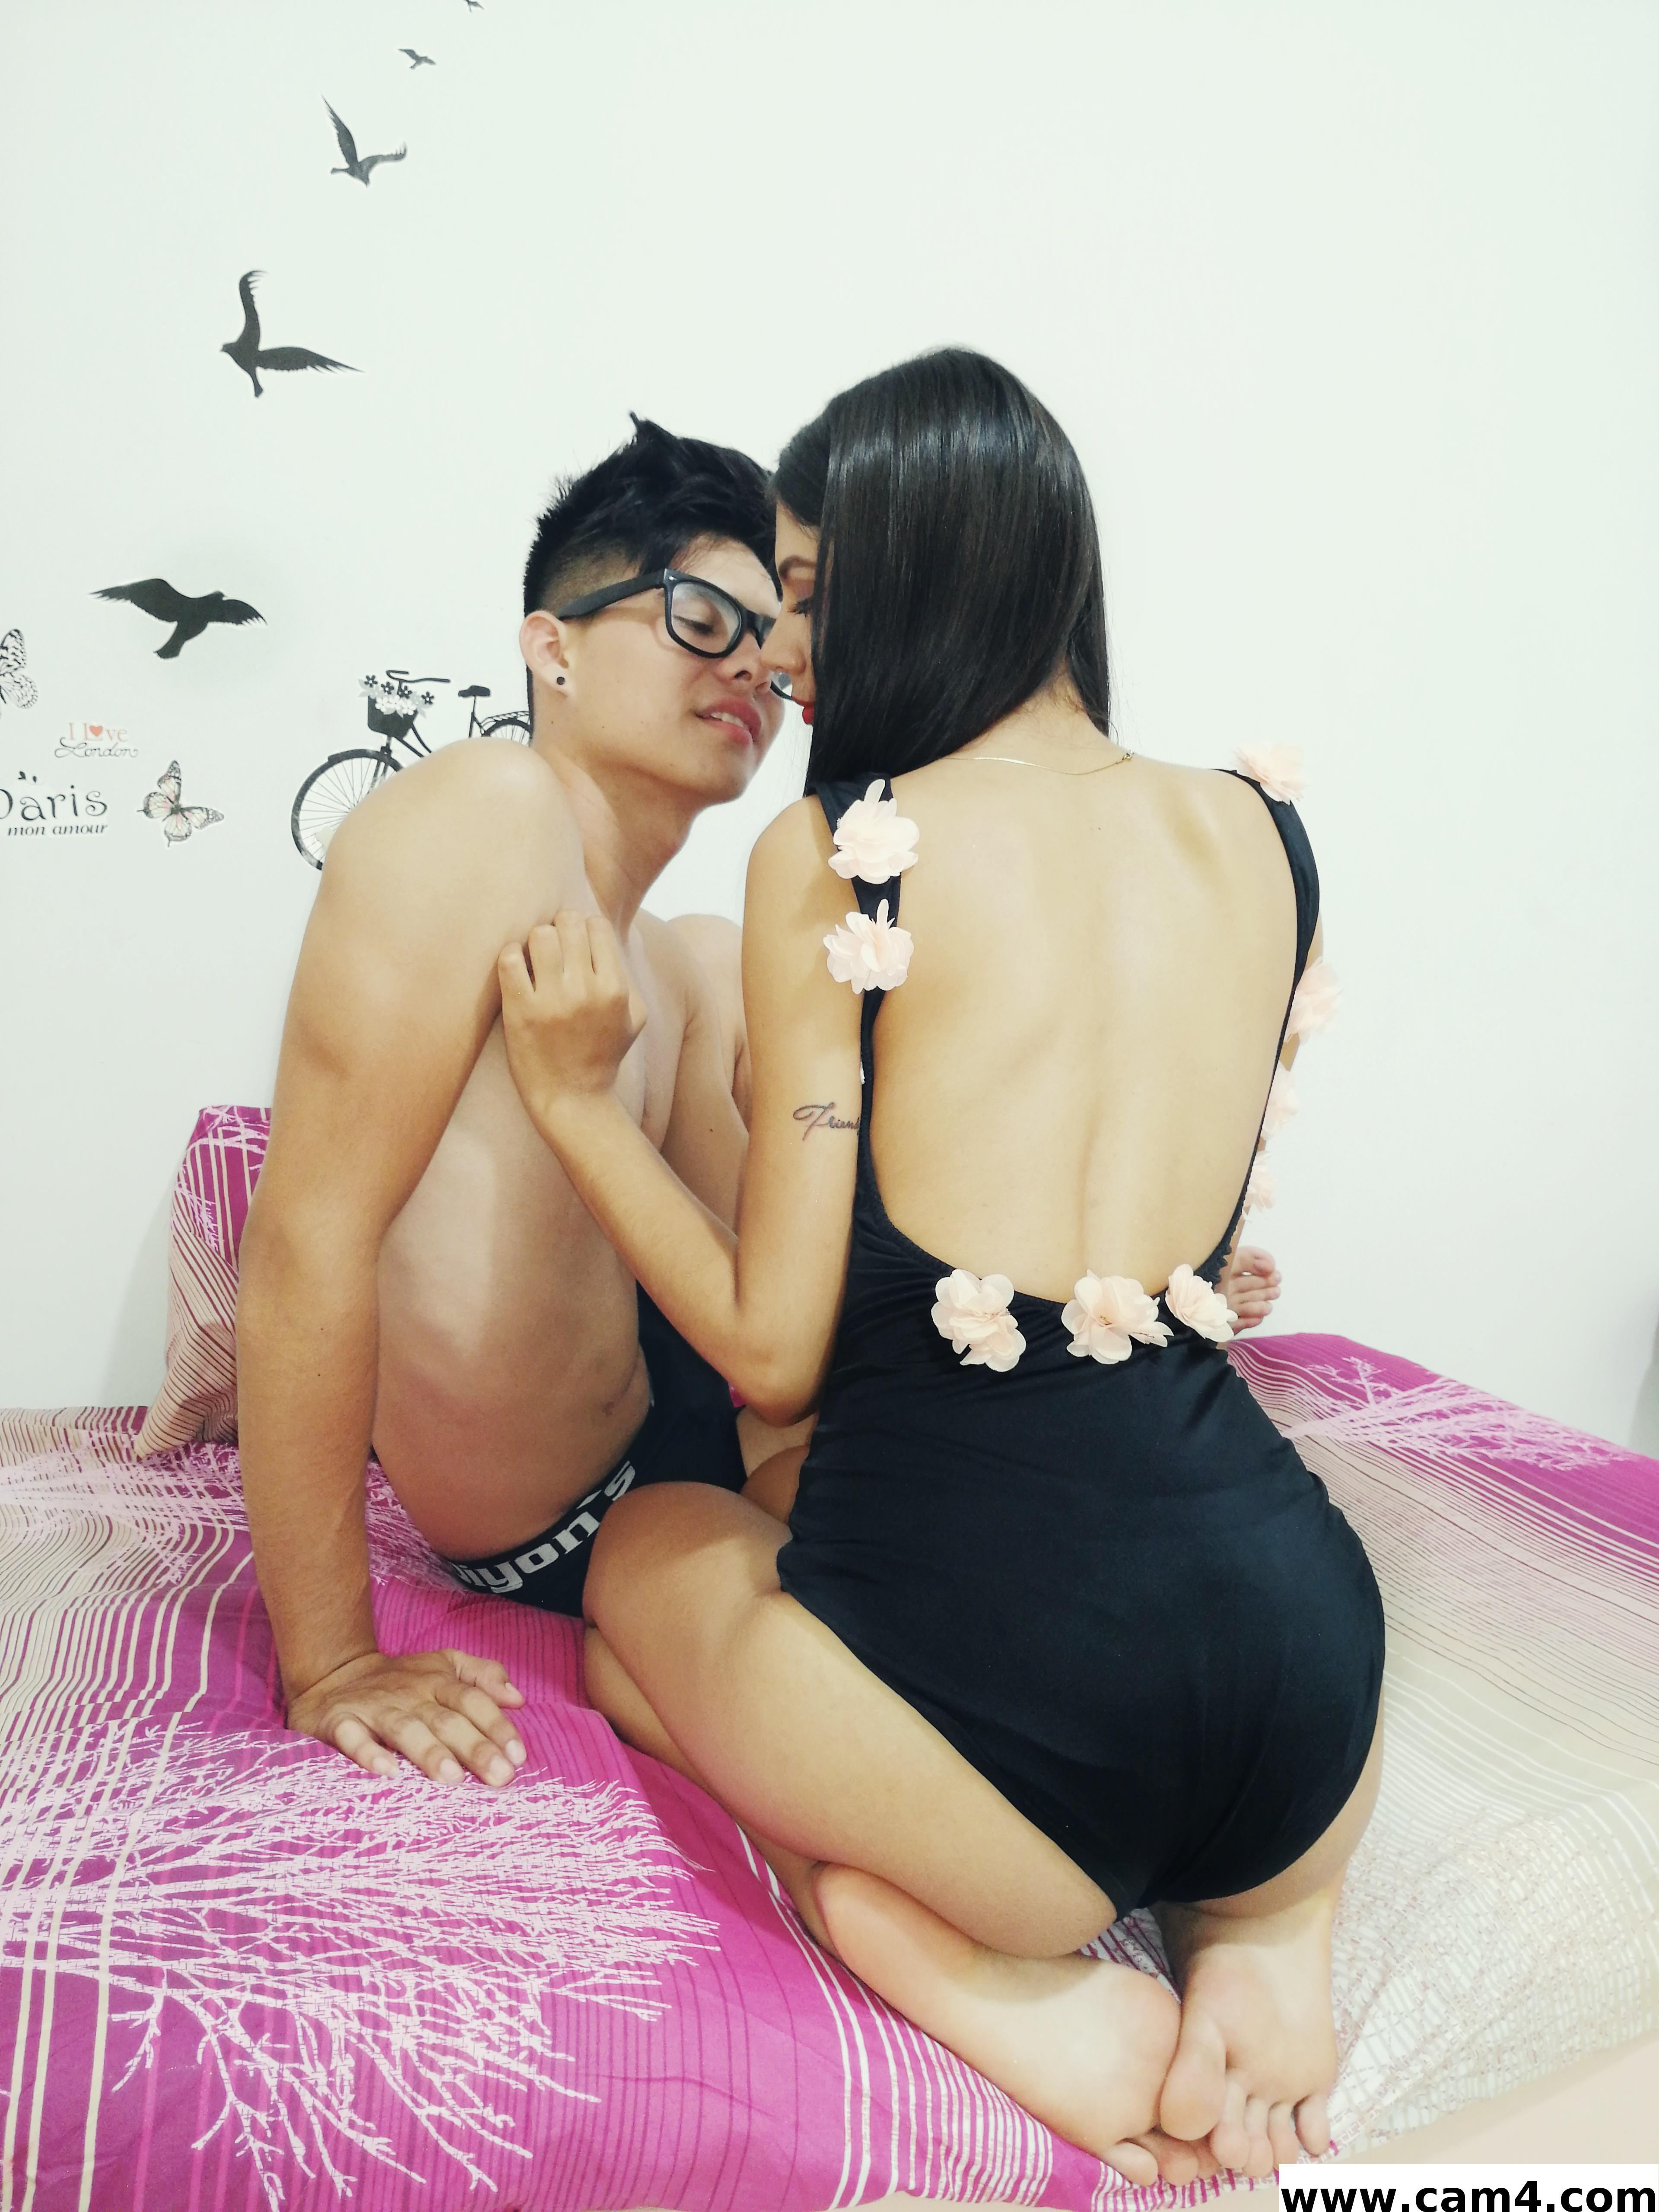 Eva and tommy?s=cb6fgrtcx3mi+sln+9mvbecua8eyxdapgp4q43ejjla=